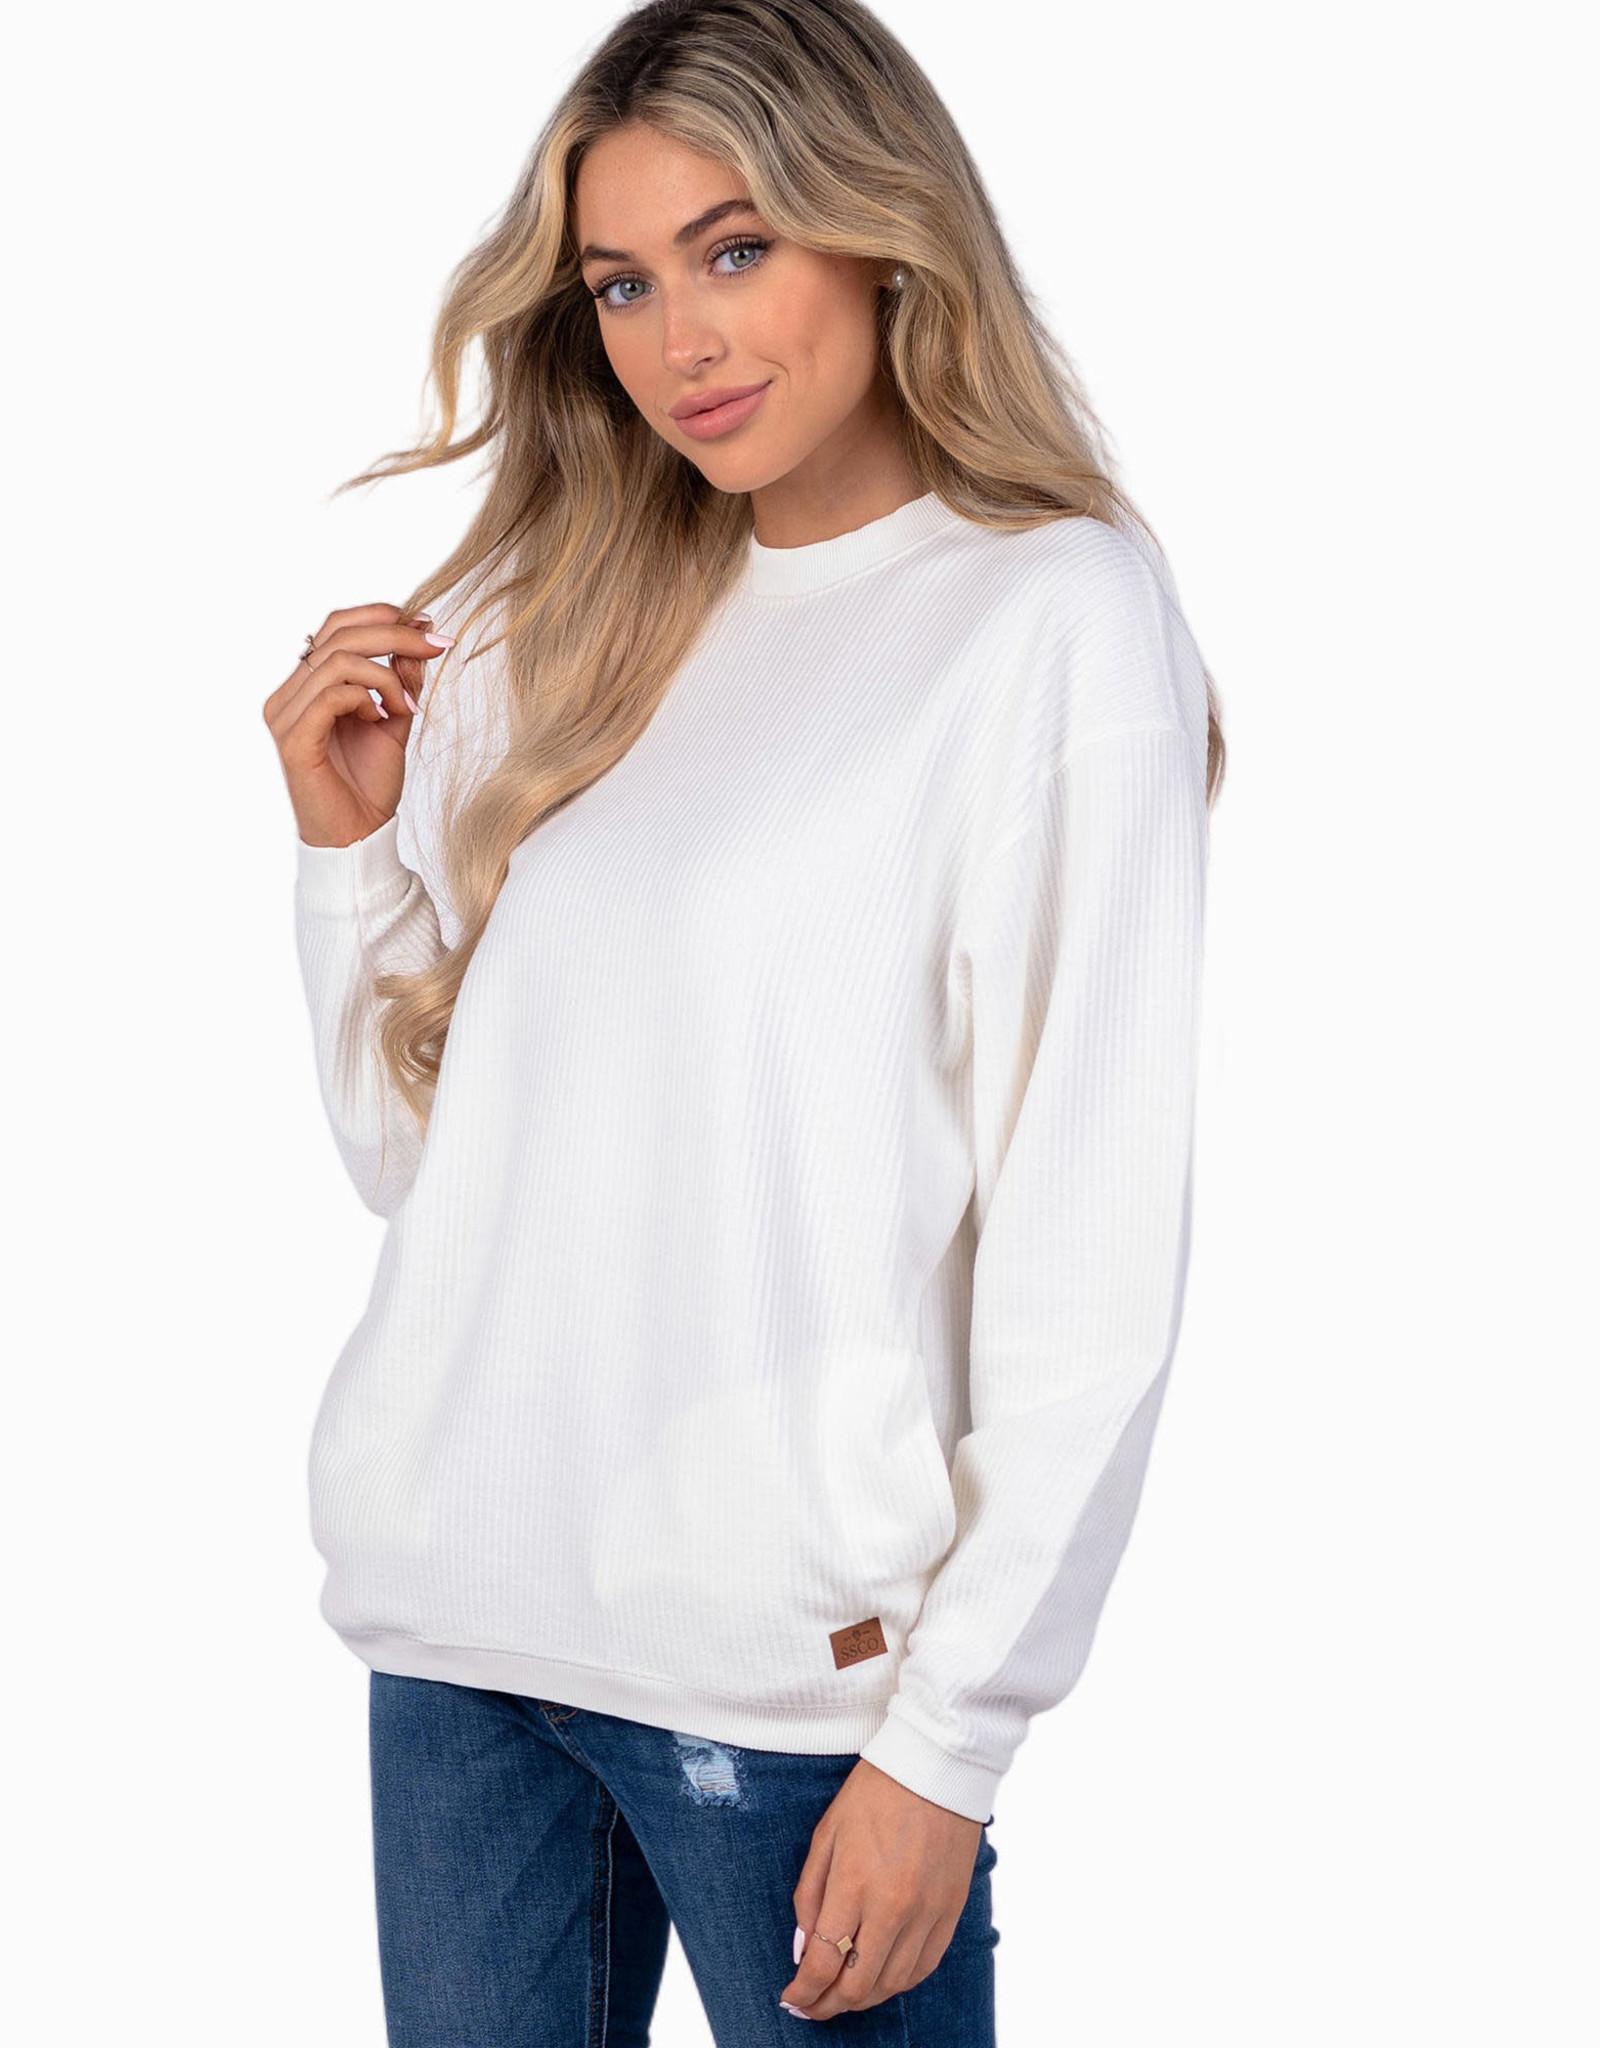 Southern Shirt Co Corduroy Sweatshirt